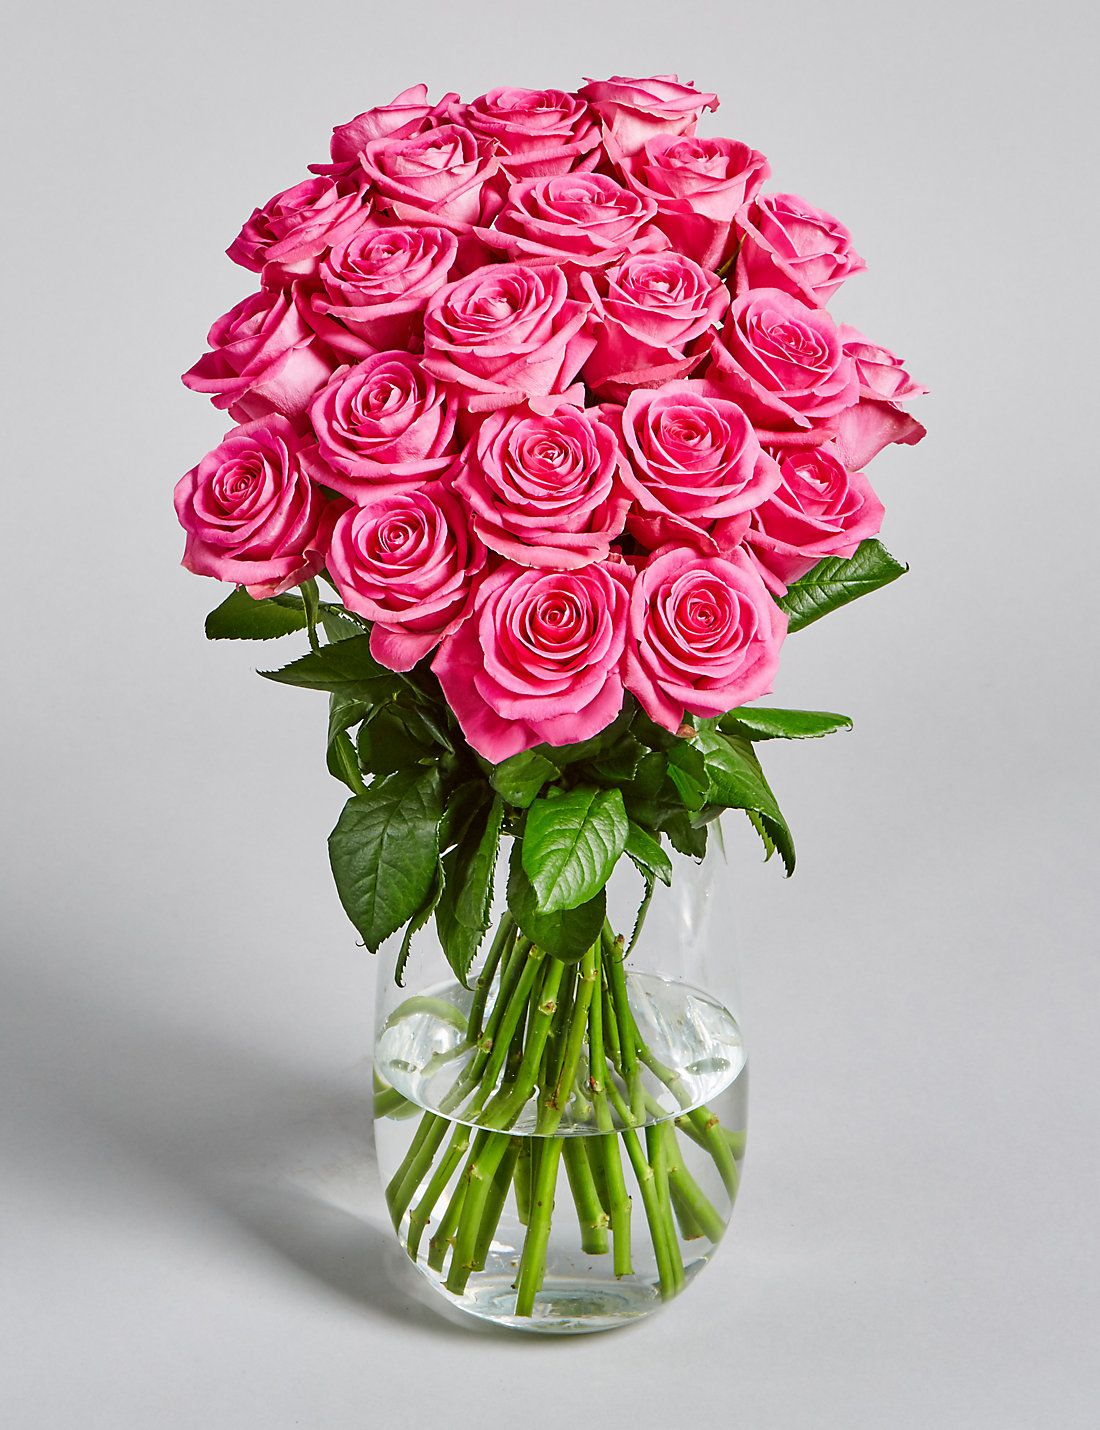 flowerdeliverytopunjab sendflowersjalandhar